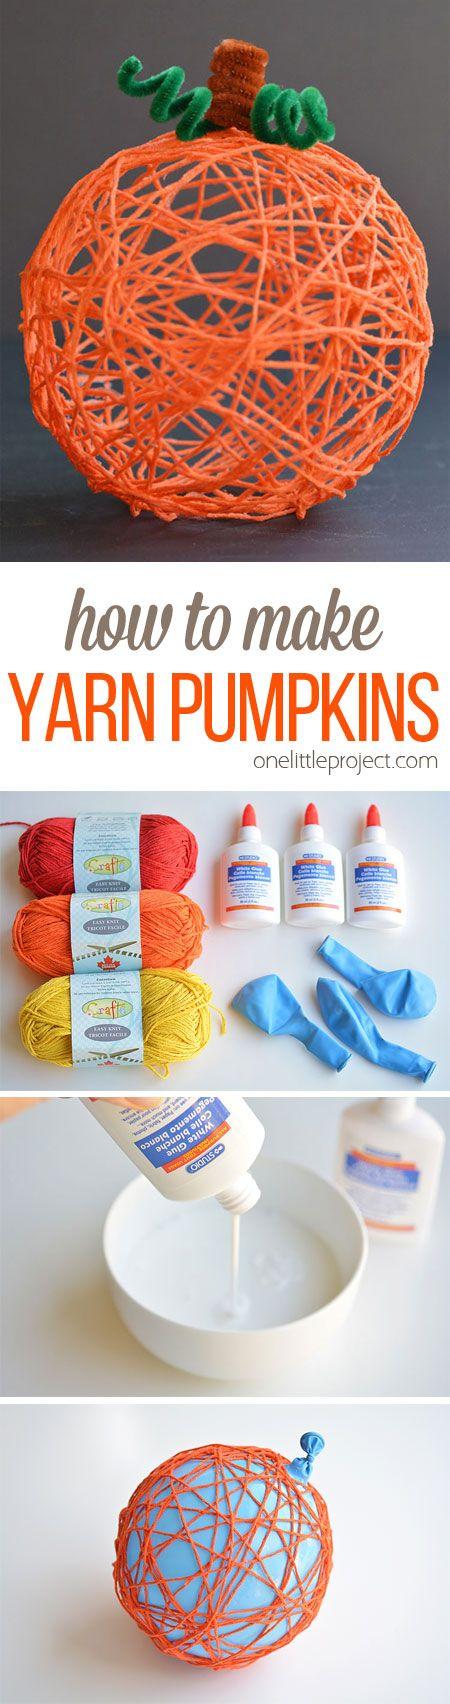 How to Make Yarn Pumpkin for Halloween